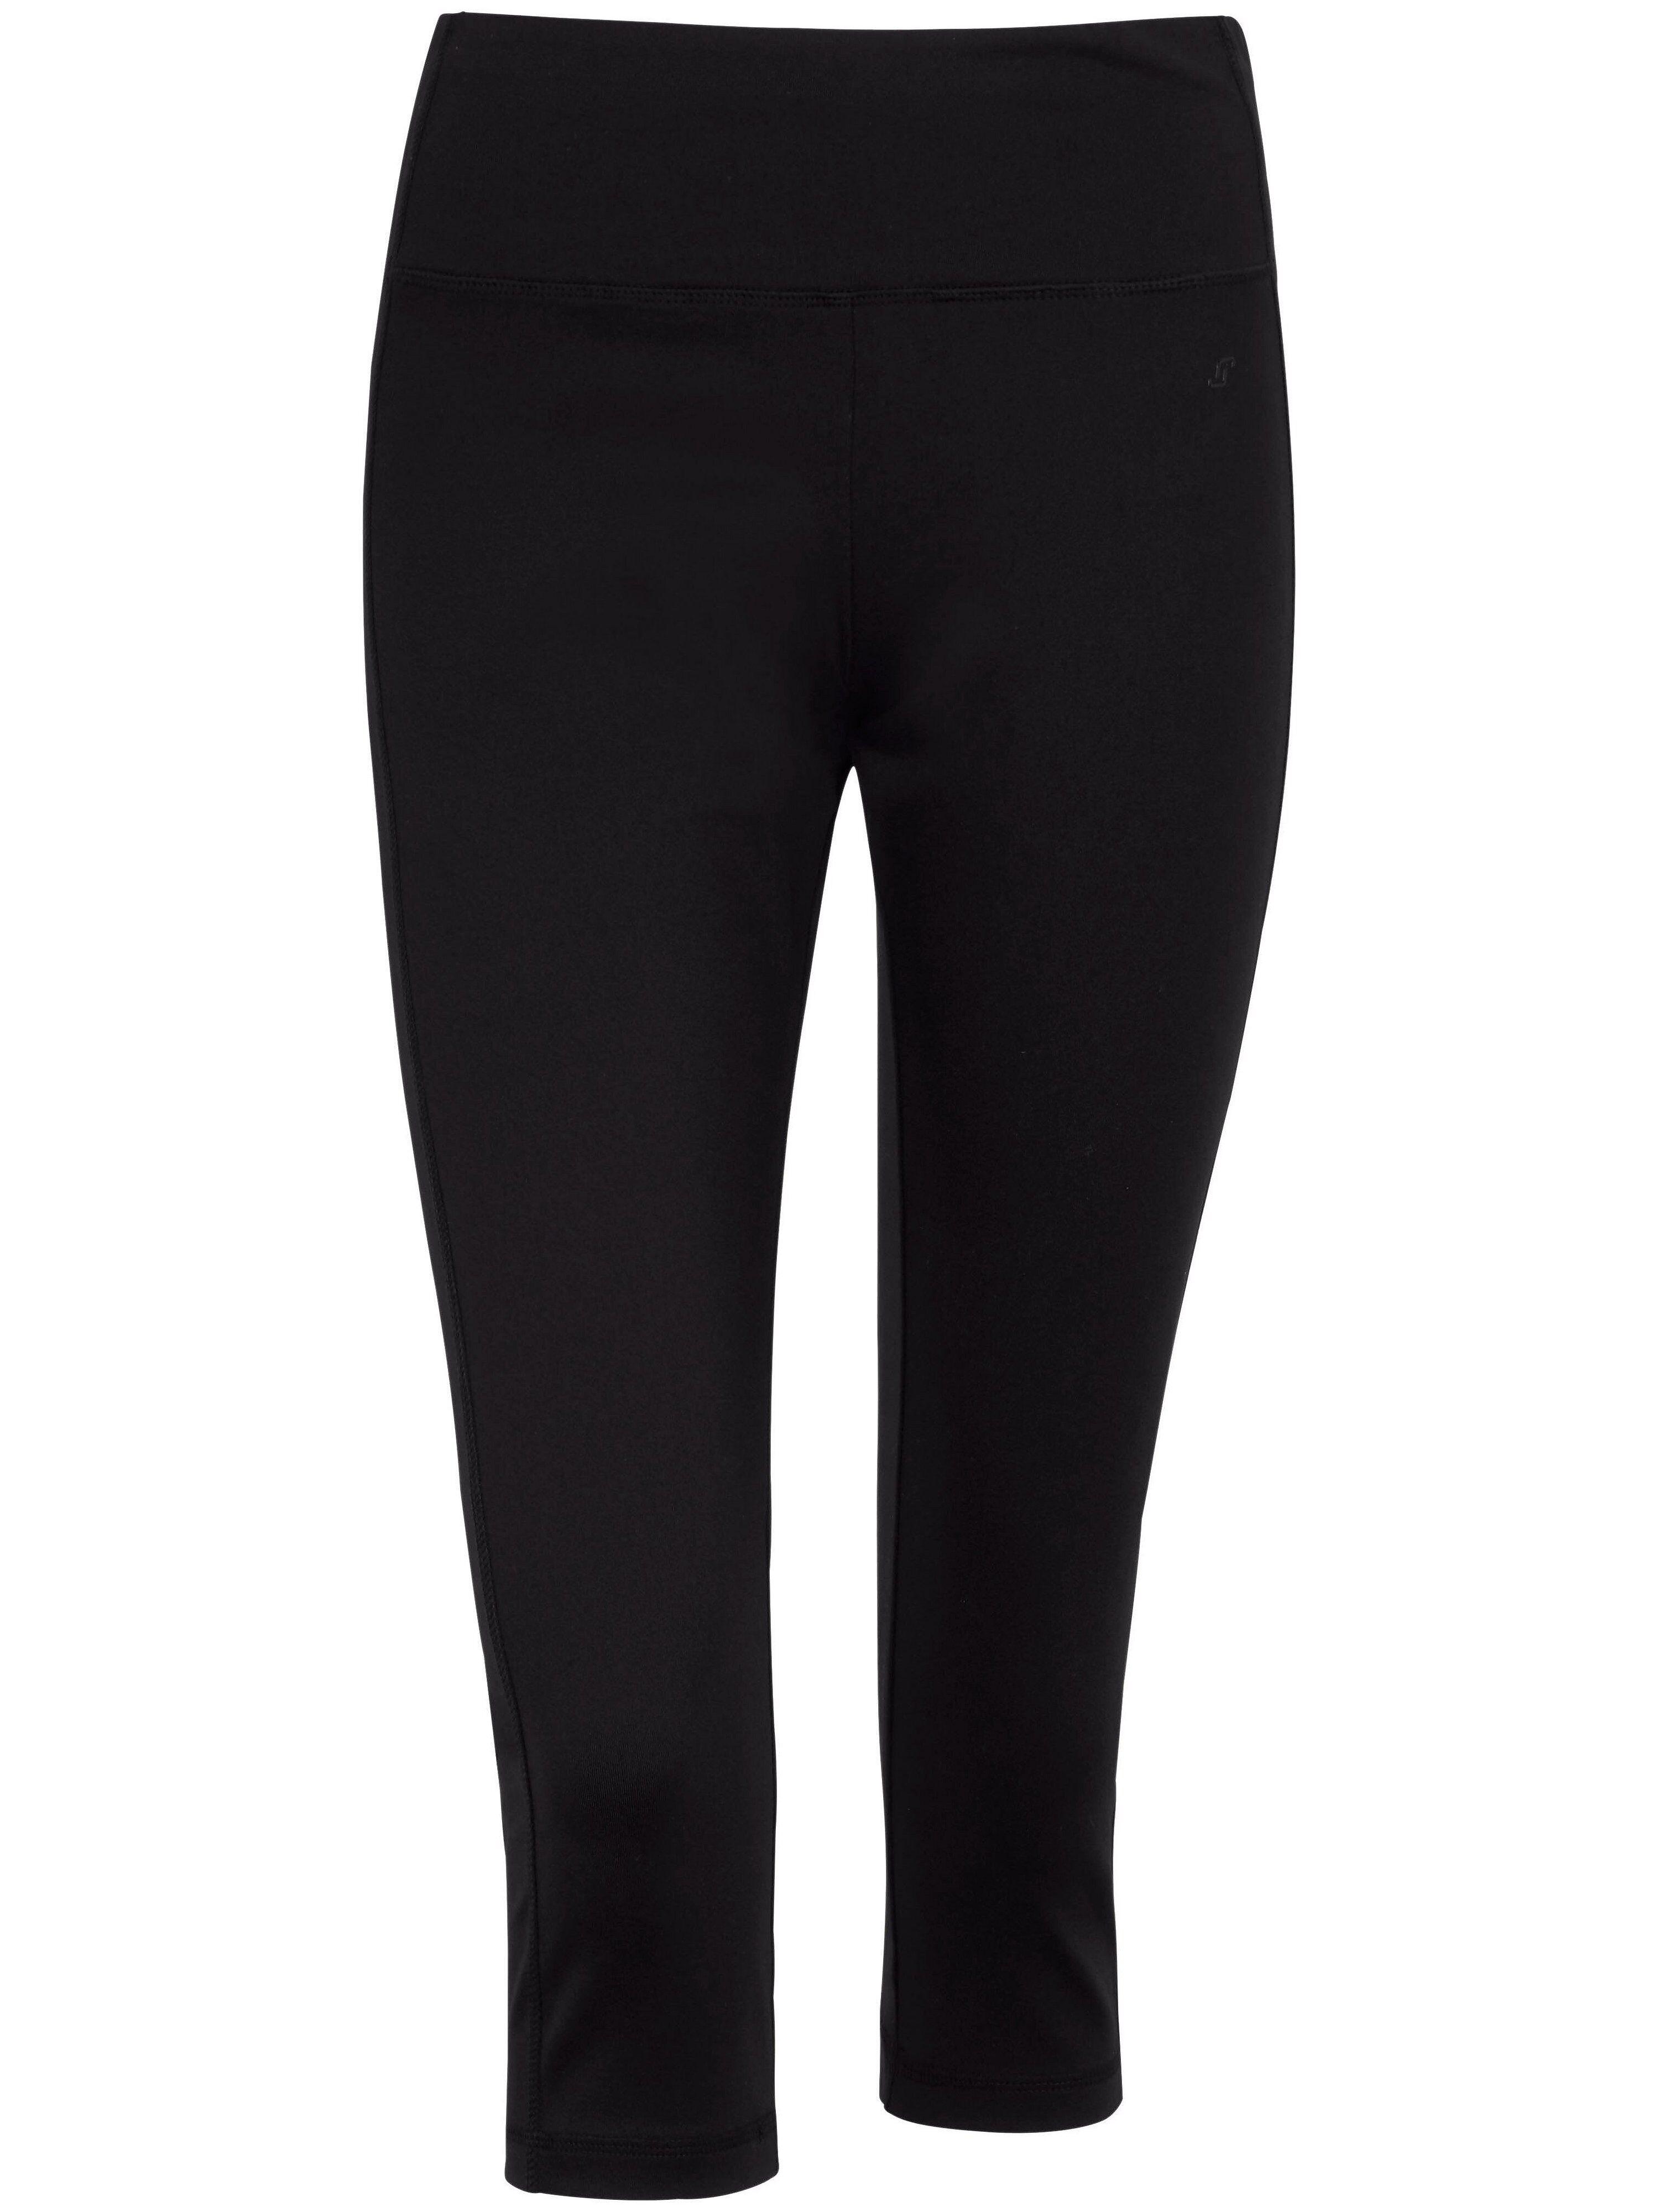 Joy Capribuks 'BodyFit' Fra JOY Sportswear sort